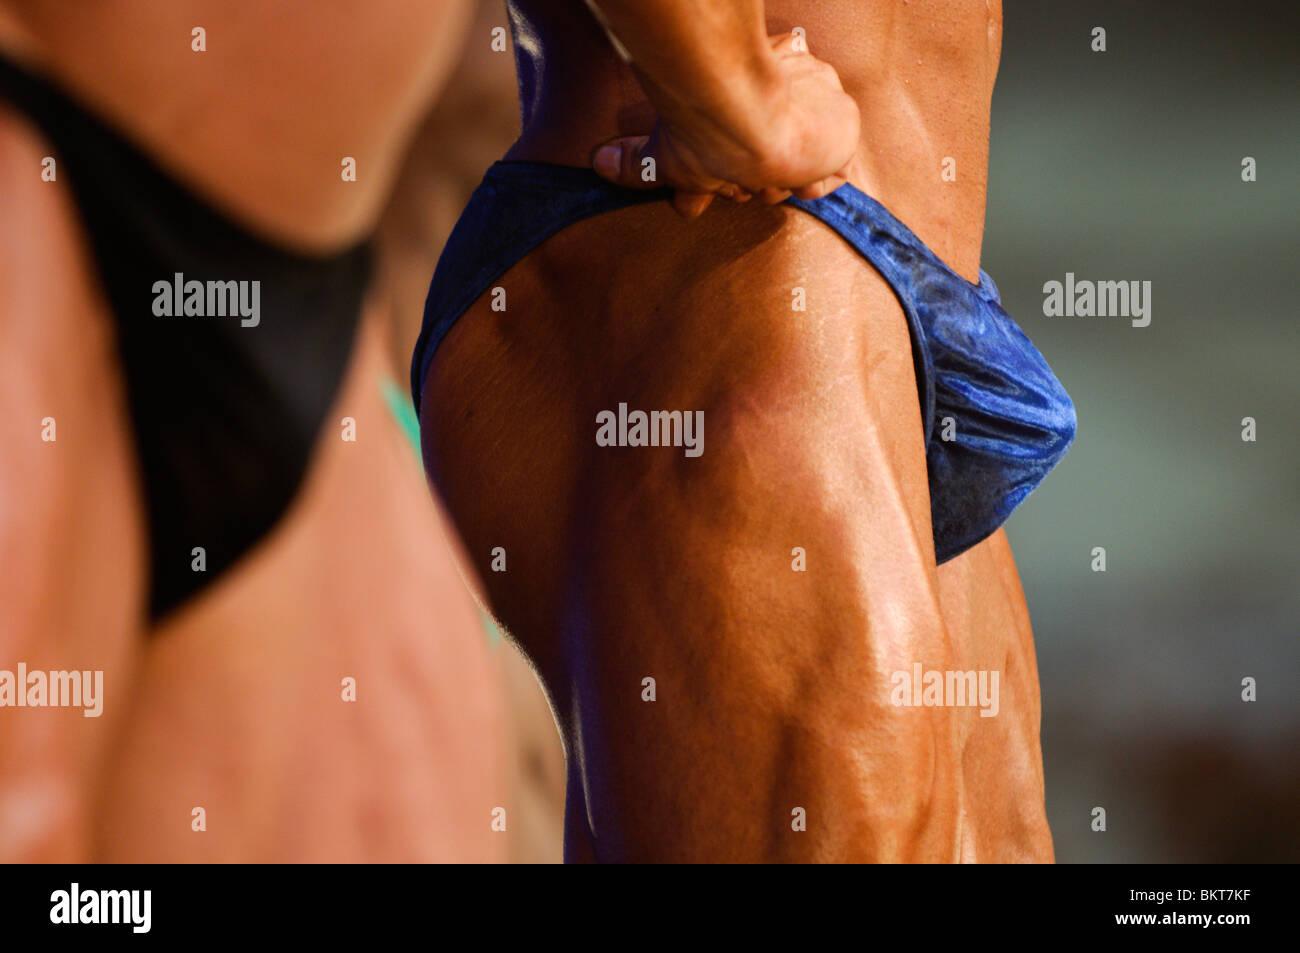 bodybuilder posing - Stock Image